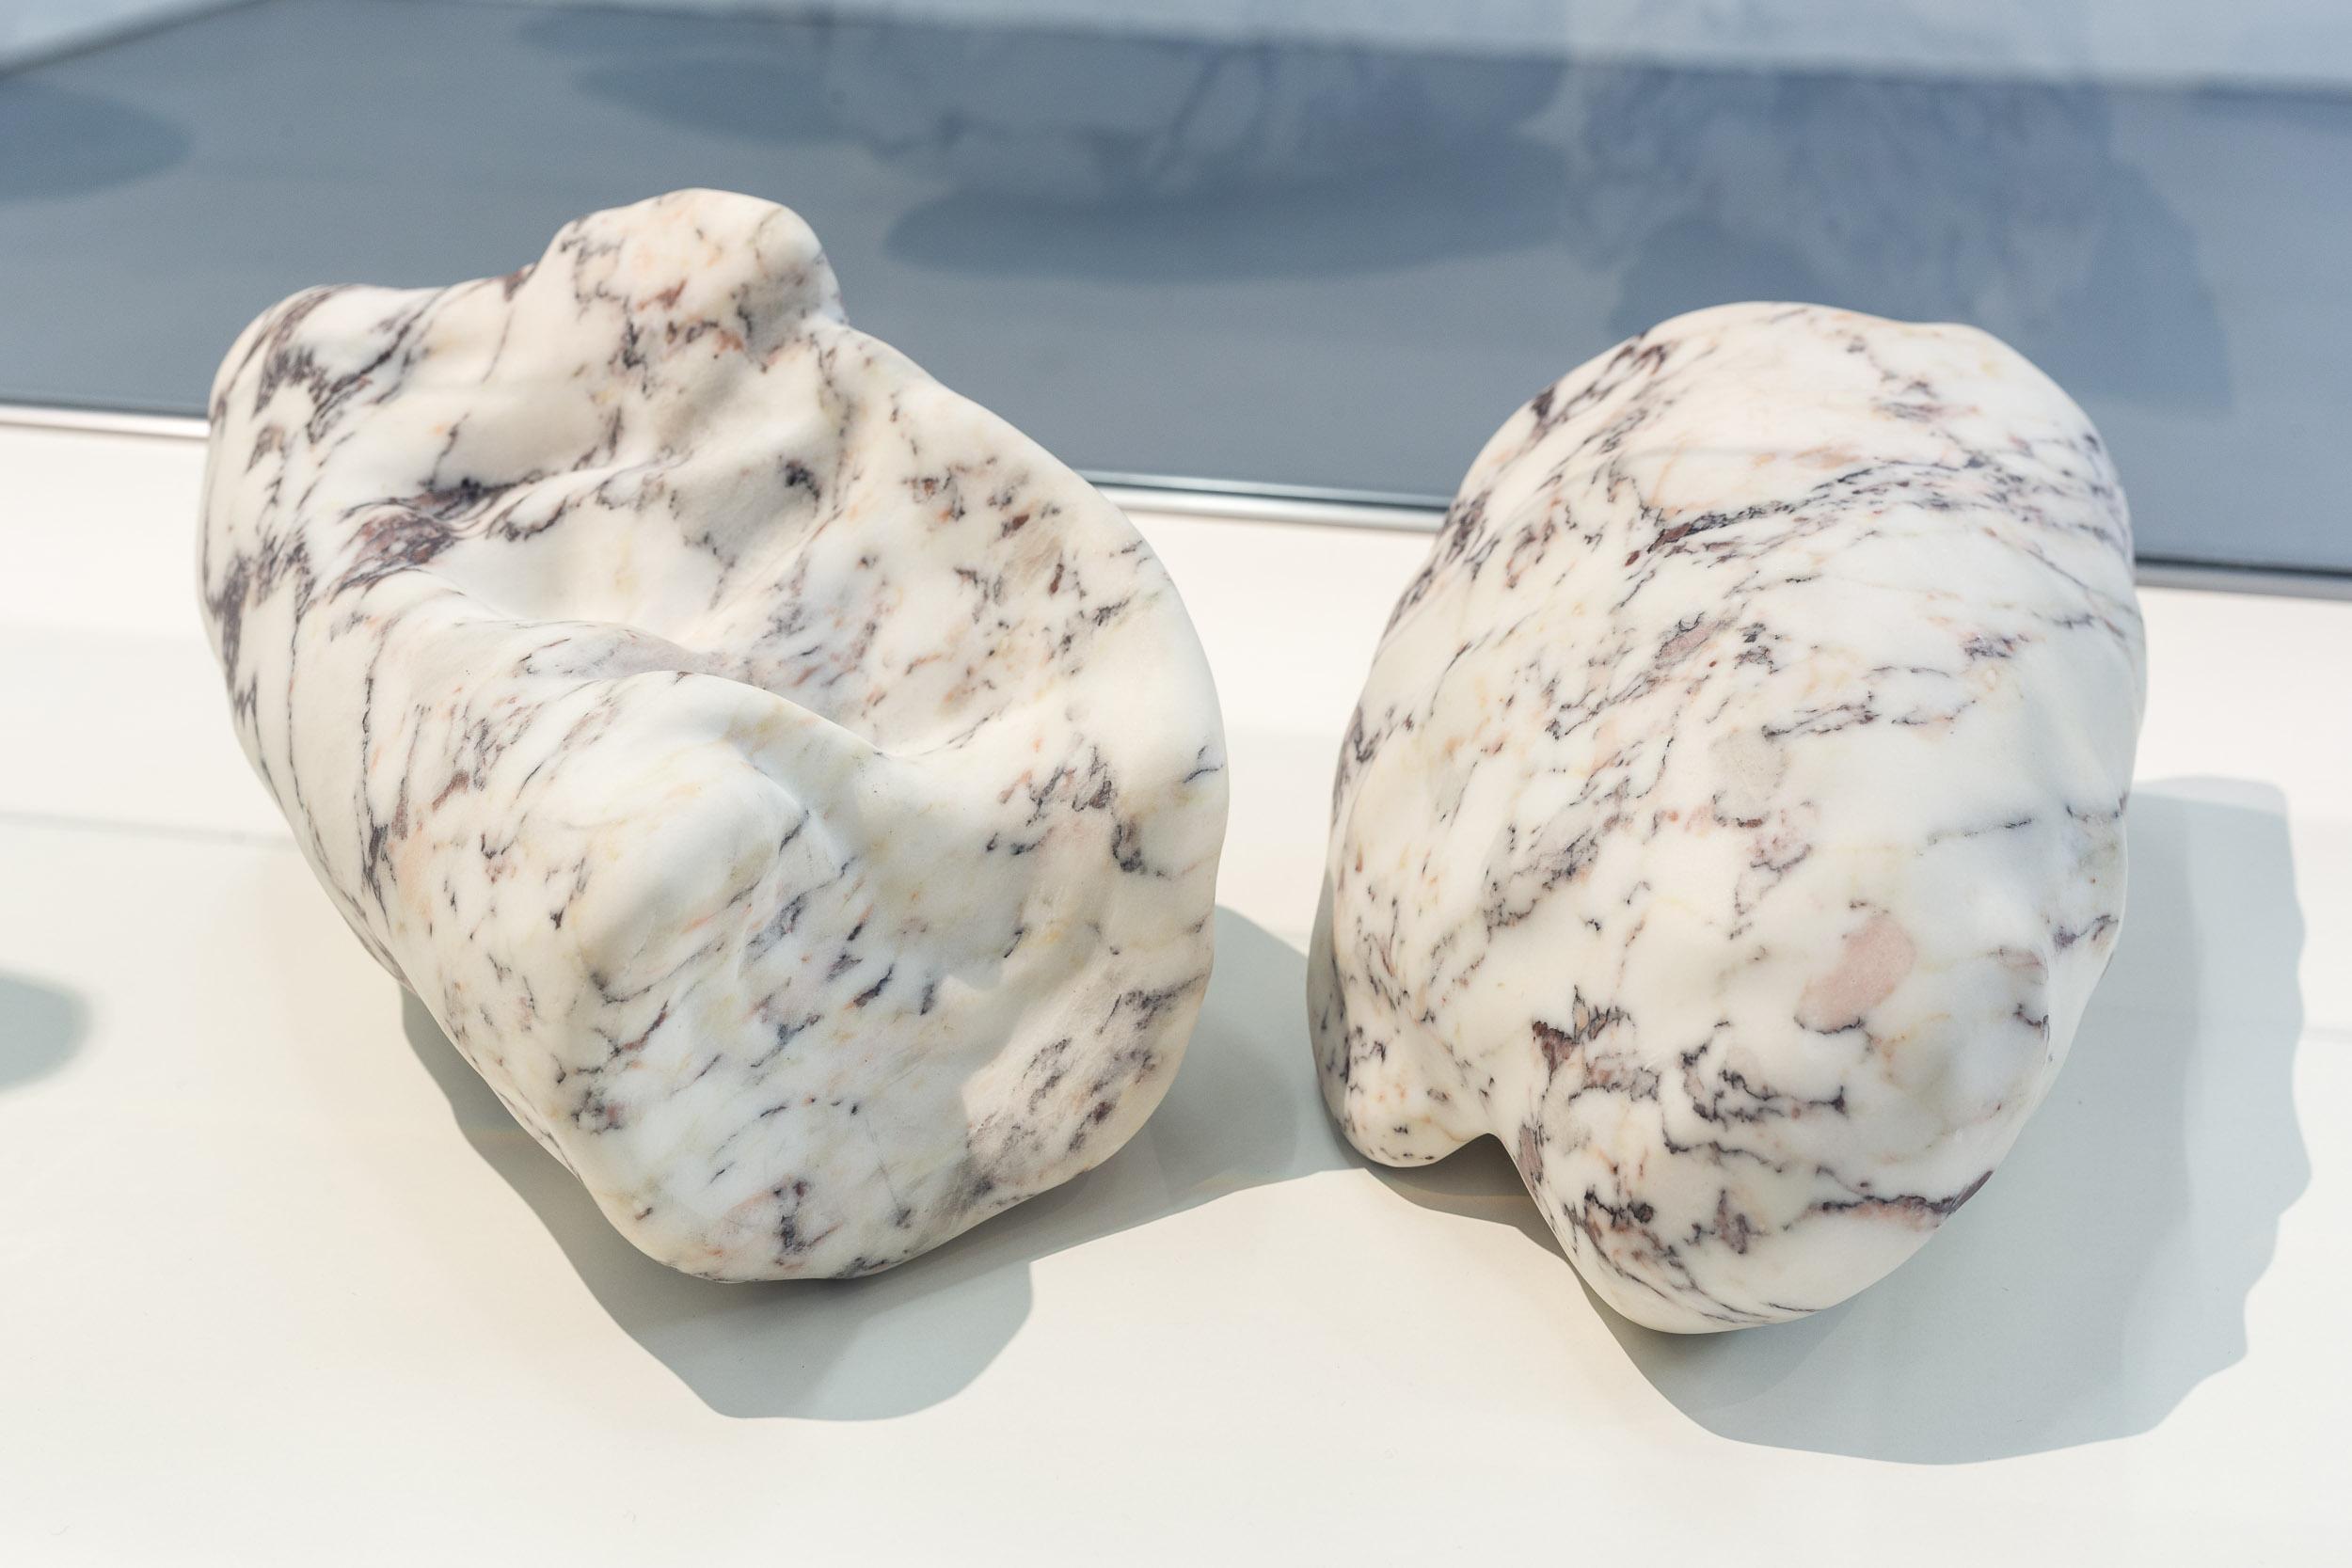 Mélodie Mousset,  Organs (detail), 2015, Marble, Stone, Bronze in Vetrine, dimension variable  Photo: Kilian Bannwart